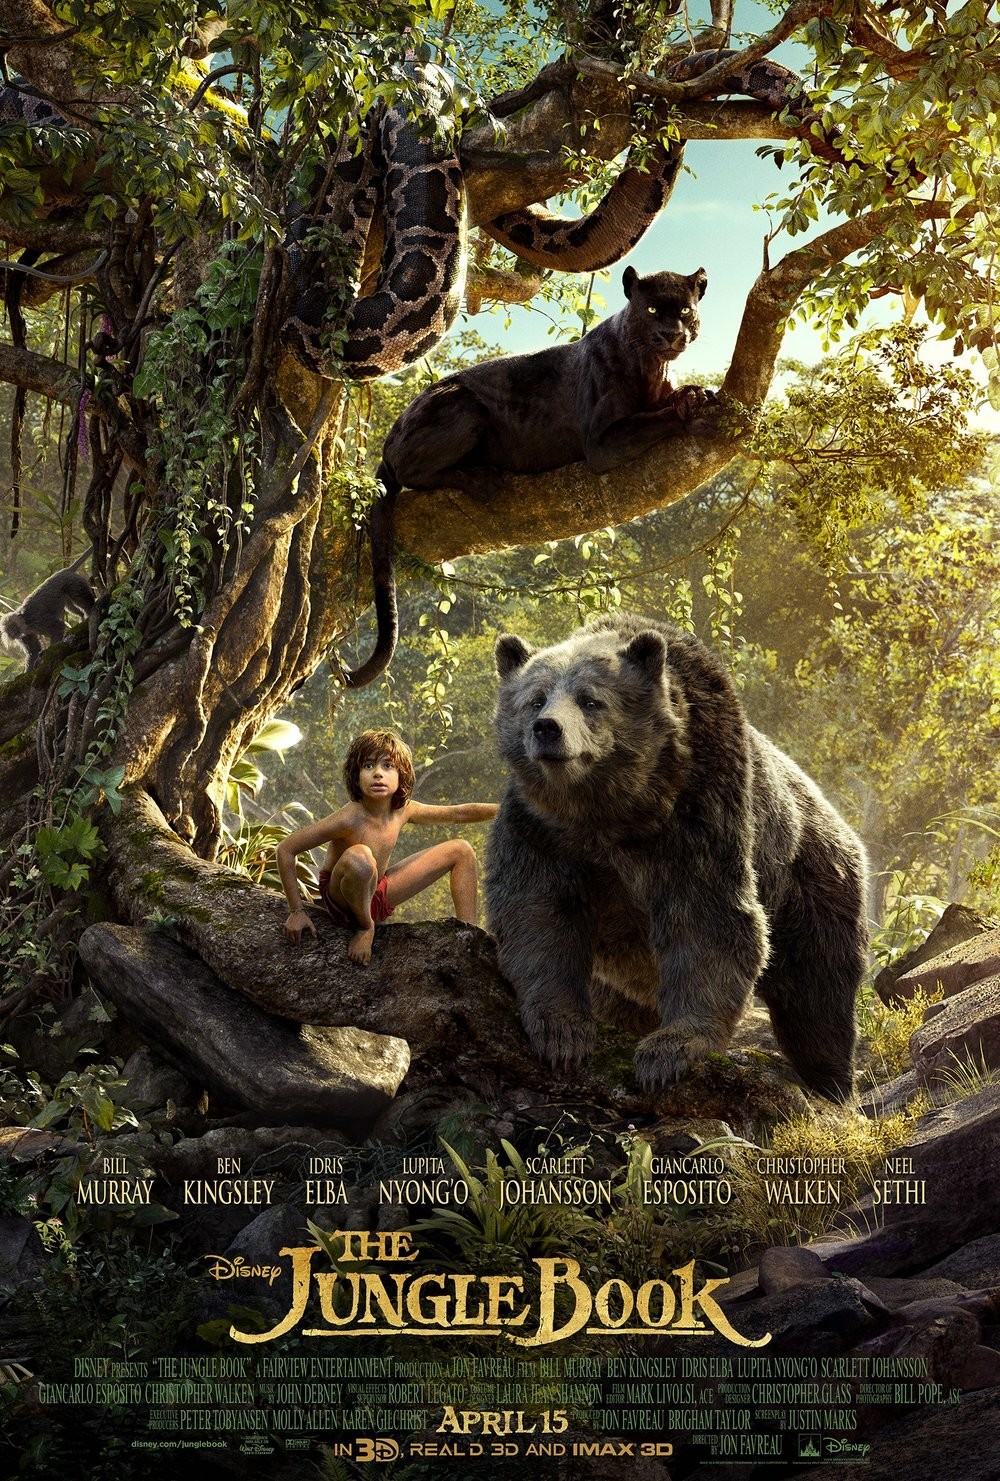 2016 The Jungle Book.jpg